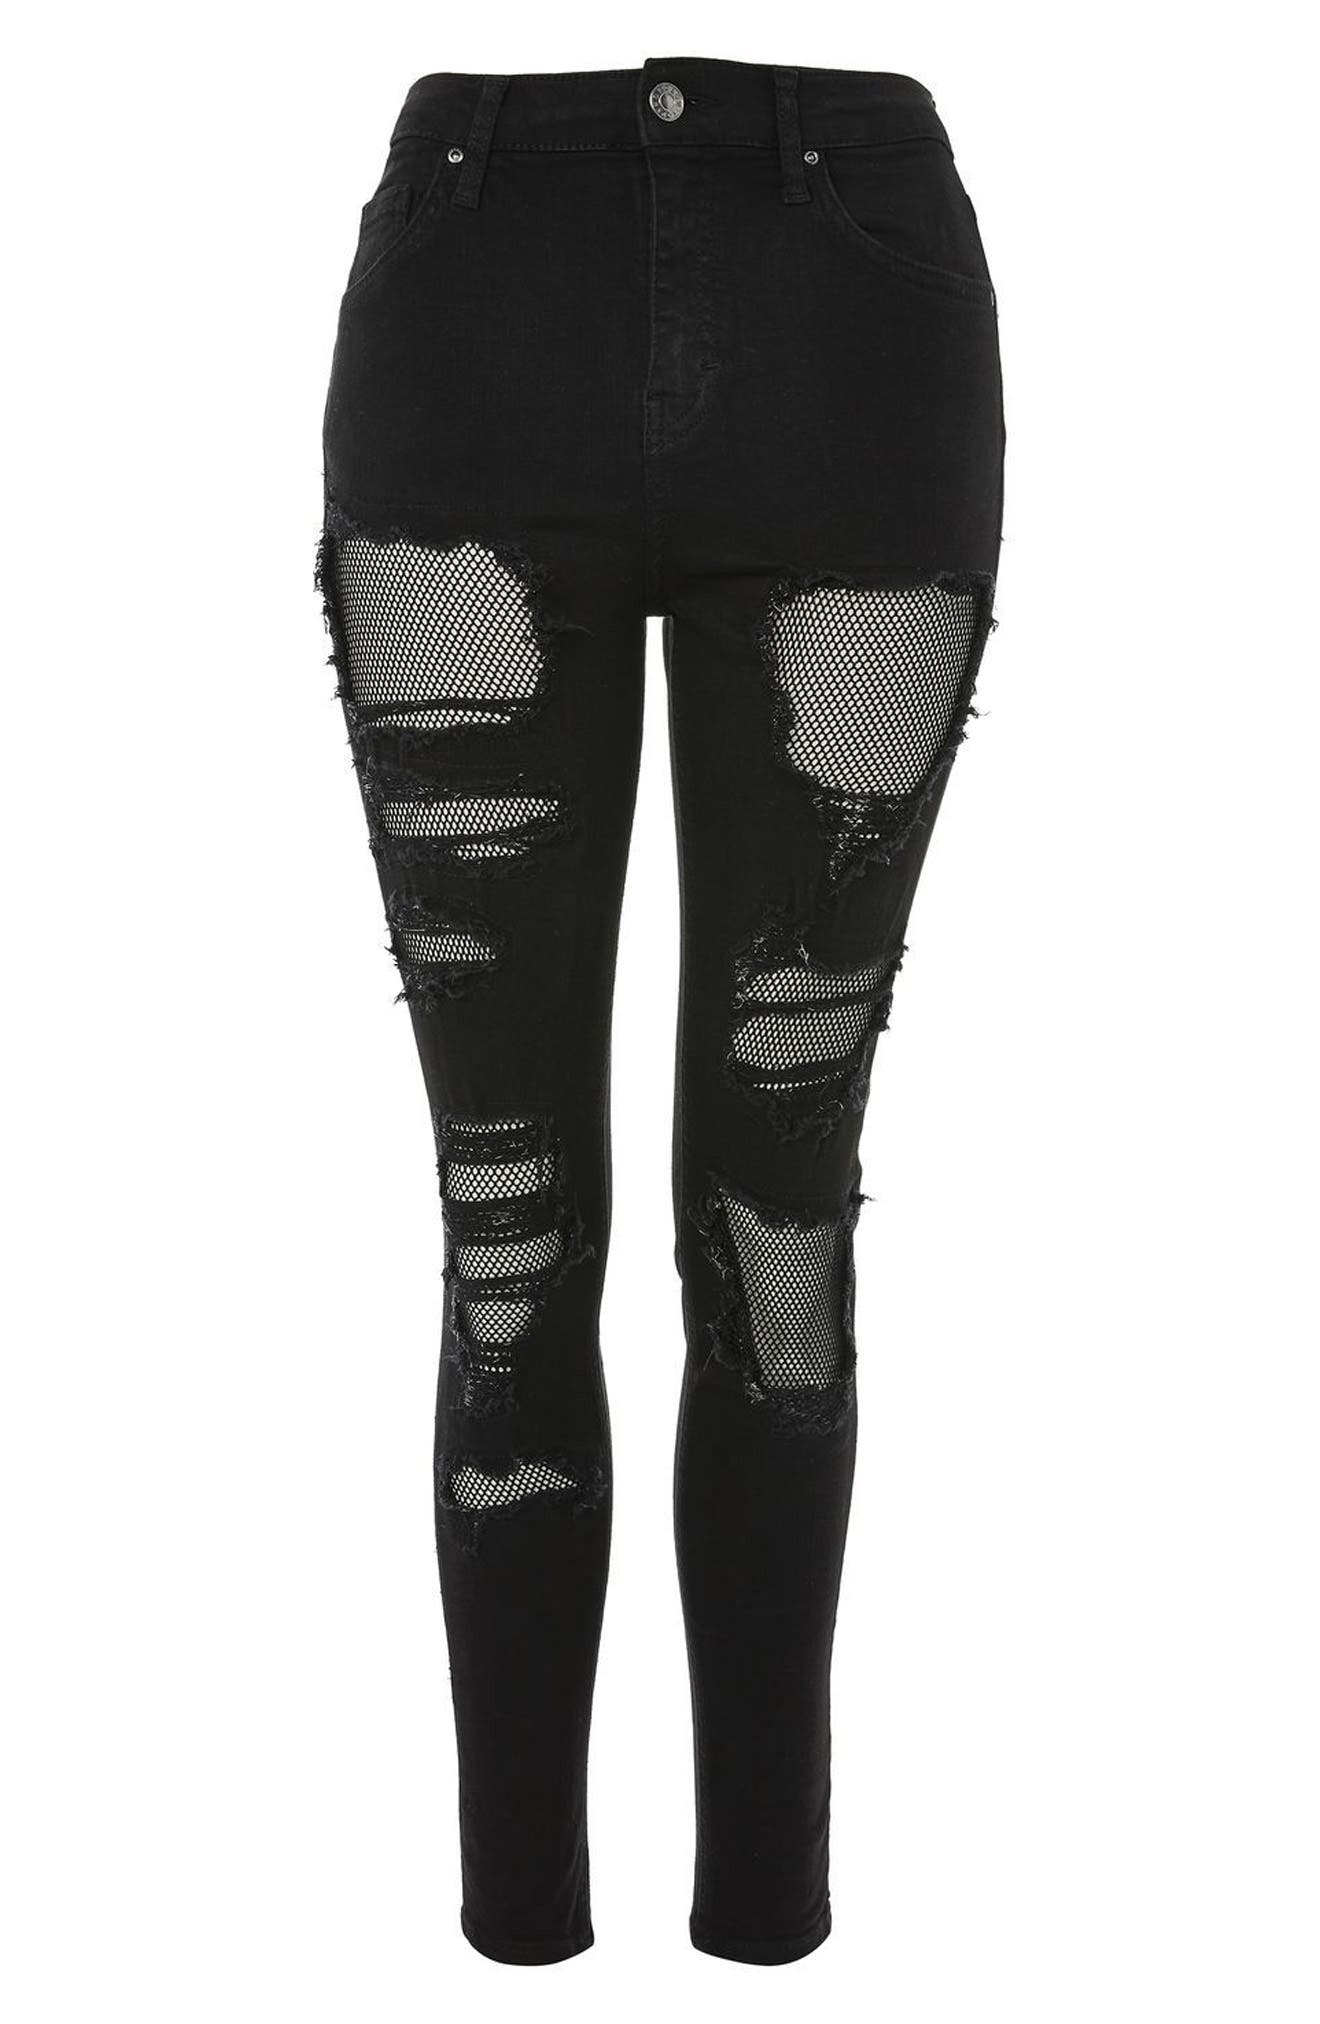 Jamie Black Fishnet Rip Skinny Jeans,                             Alternate thumbnail 3, color,                             Black